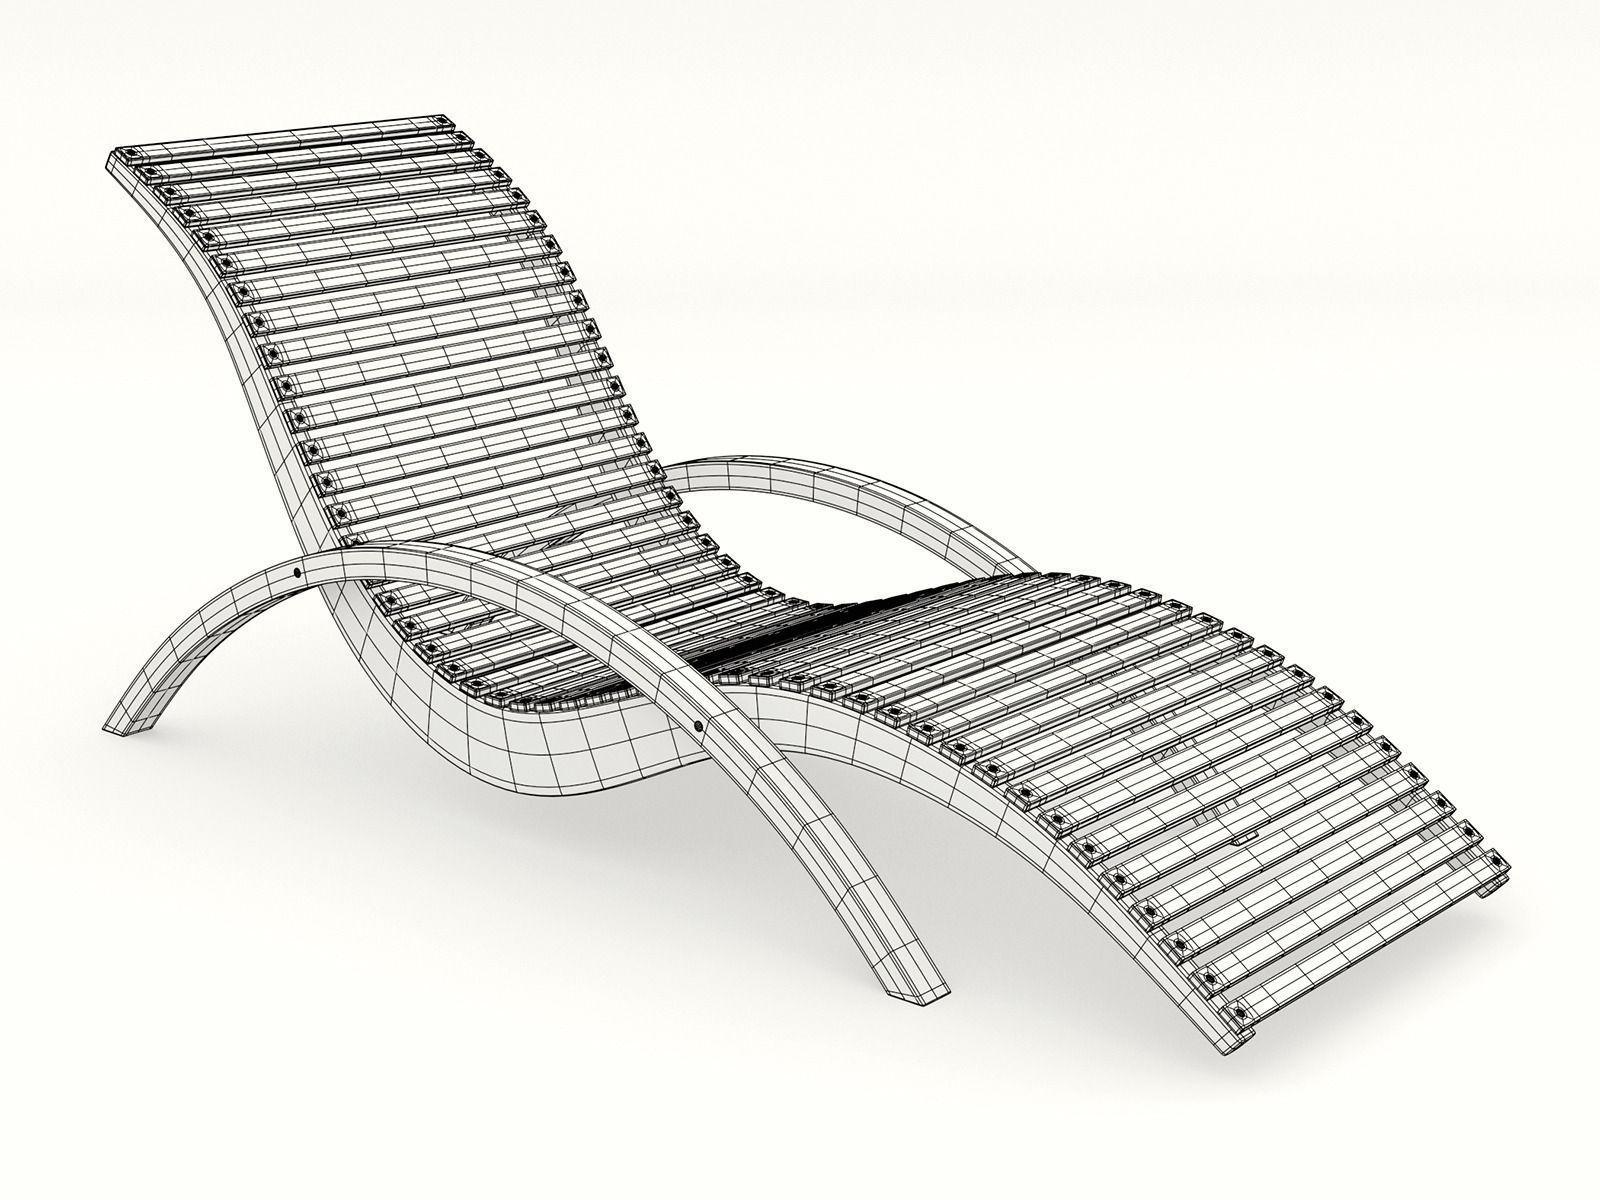 ... Lounge Chair Outdoor Wood Patio Deck 3d Model Obj Dxf Mtl 3